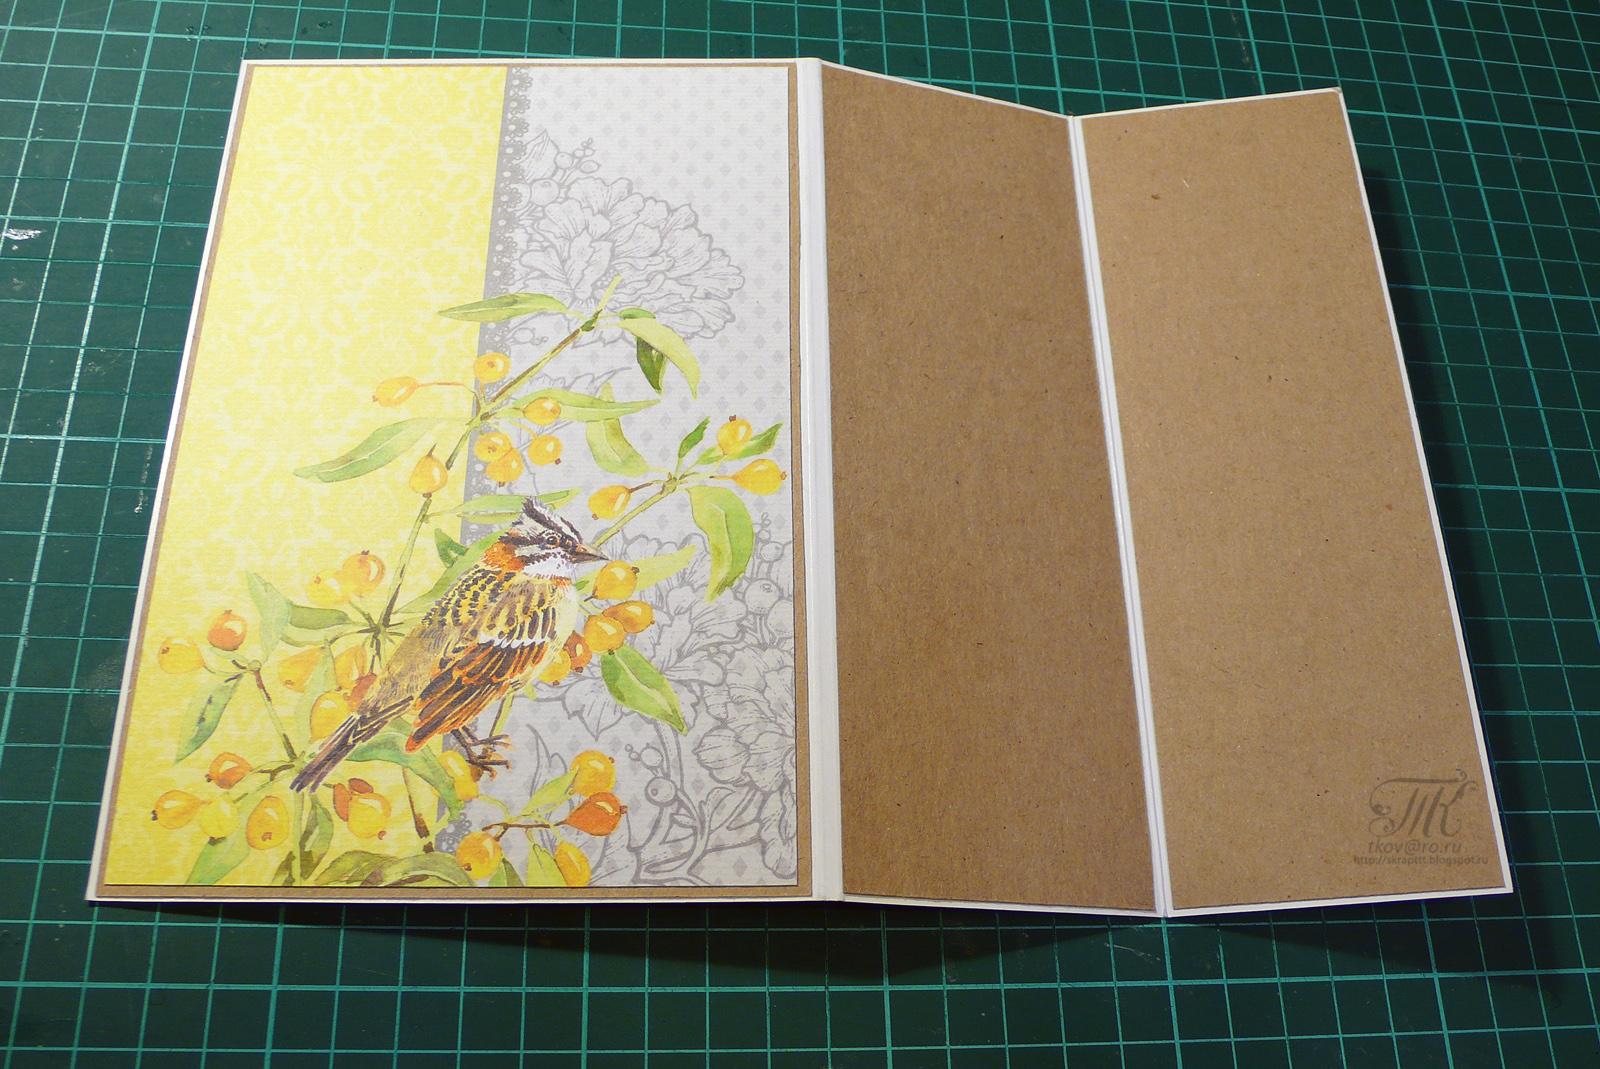 Картинки, открытка гармошка из скрапбукинга